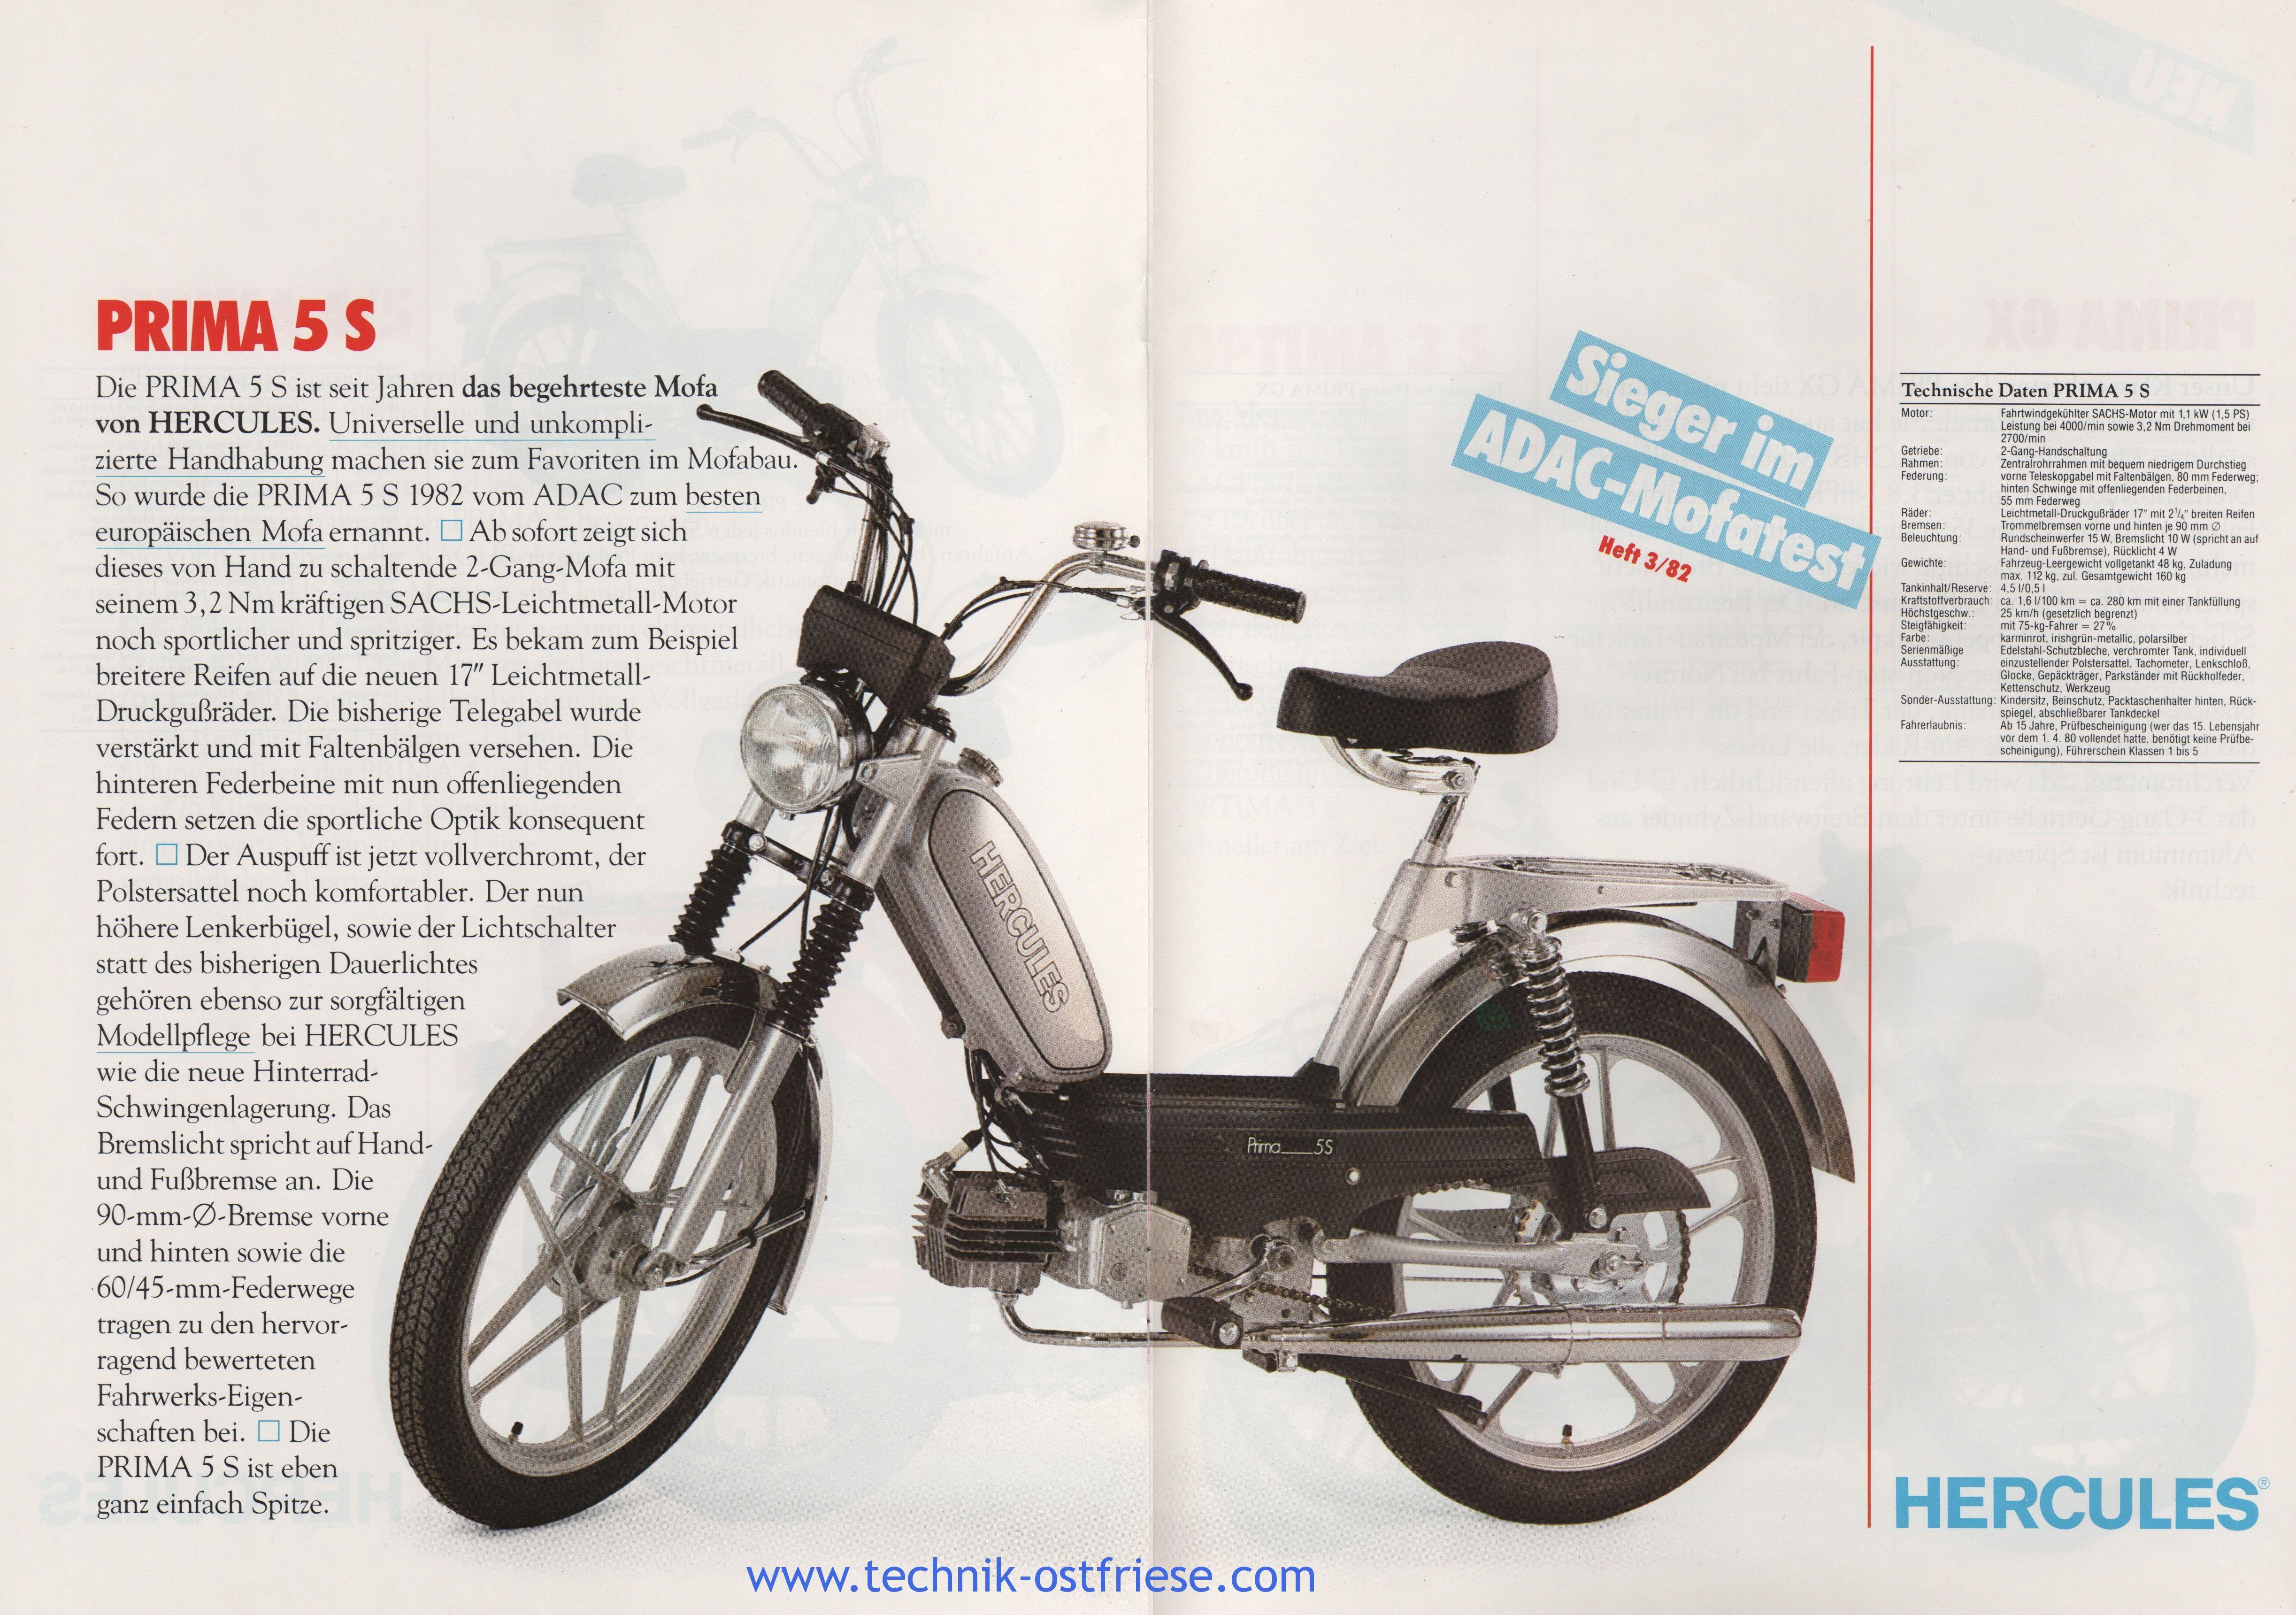 hercules prospekt mofas hercules prima 5s technische. Black Bedroom Furniture Sets. Home Design Ideas